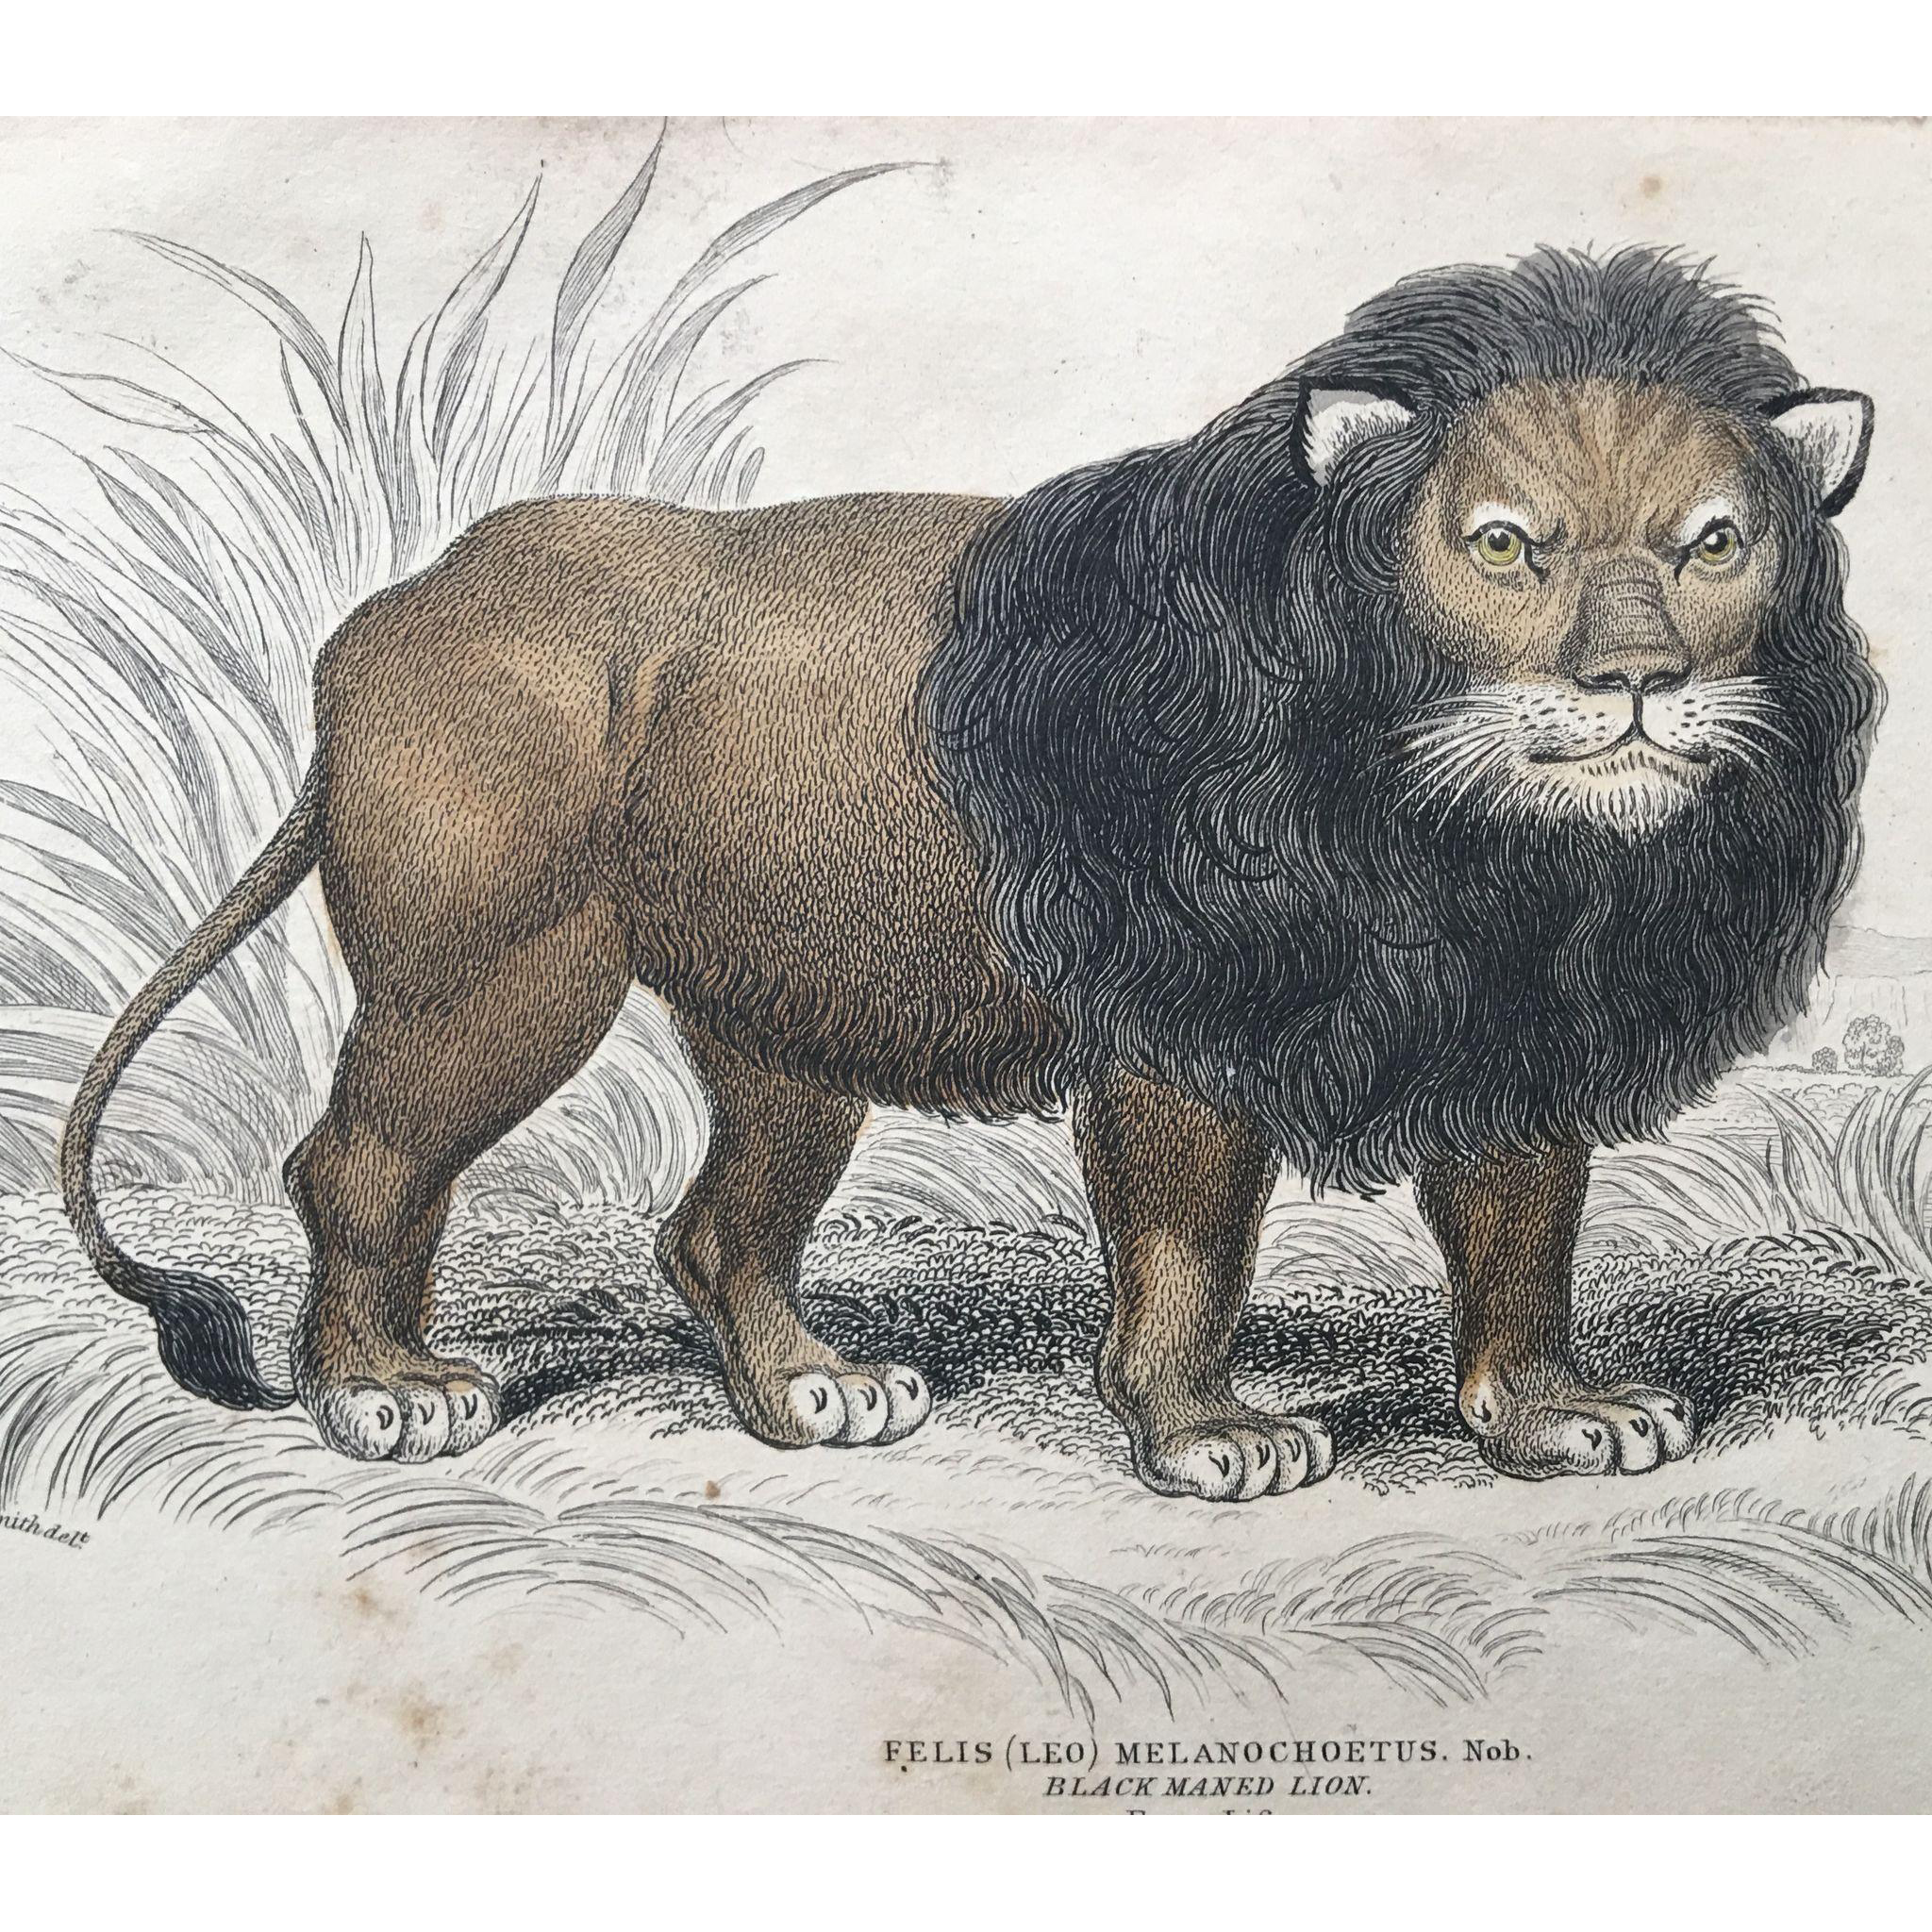 Antique Jardine Lizars Engraving FELIS LEO Melanochoetus - BLACK MANED LION